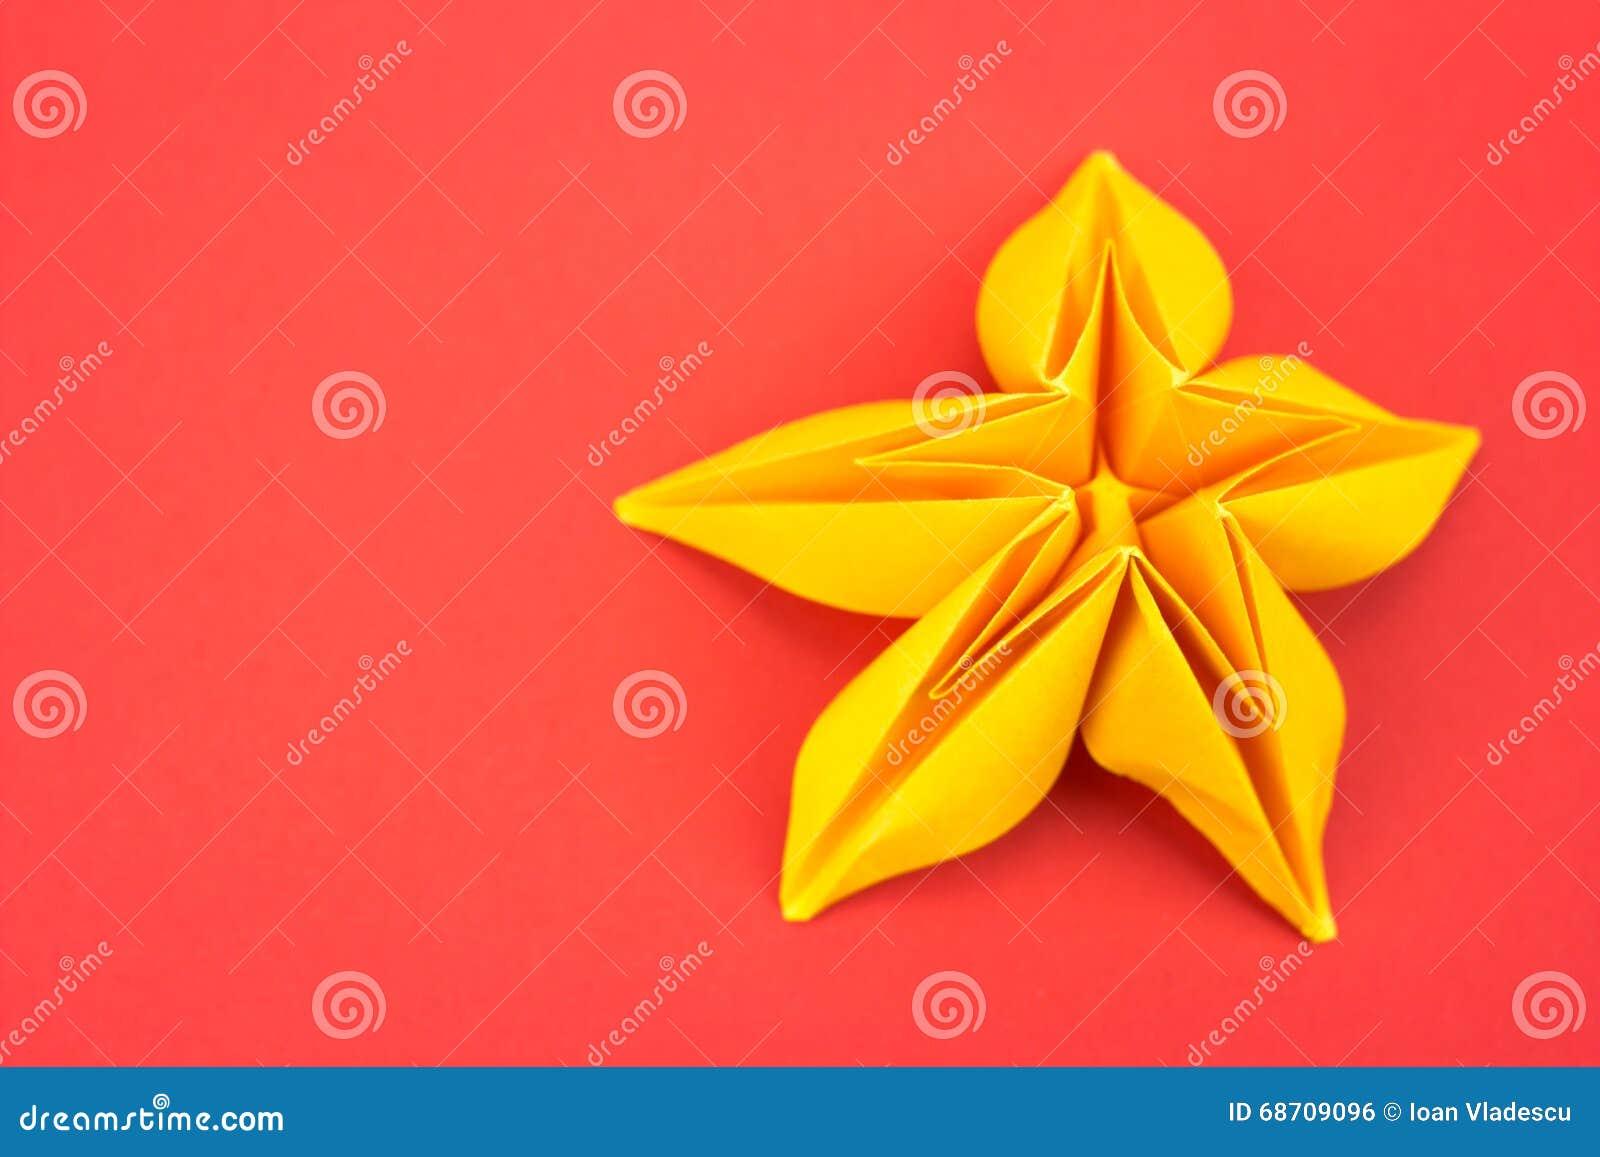 Origami Flower Stock Photo Image Of Design Present 68709096